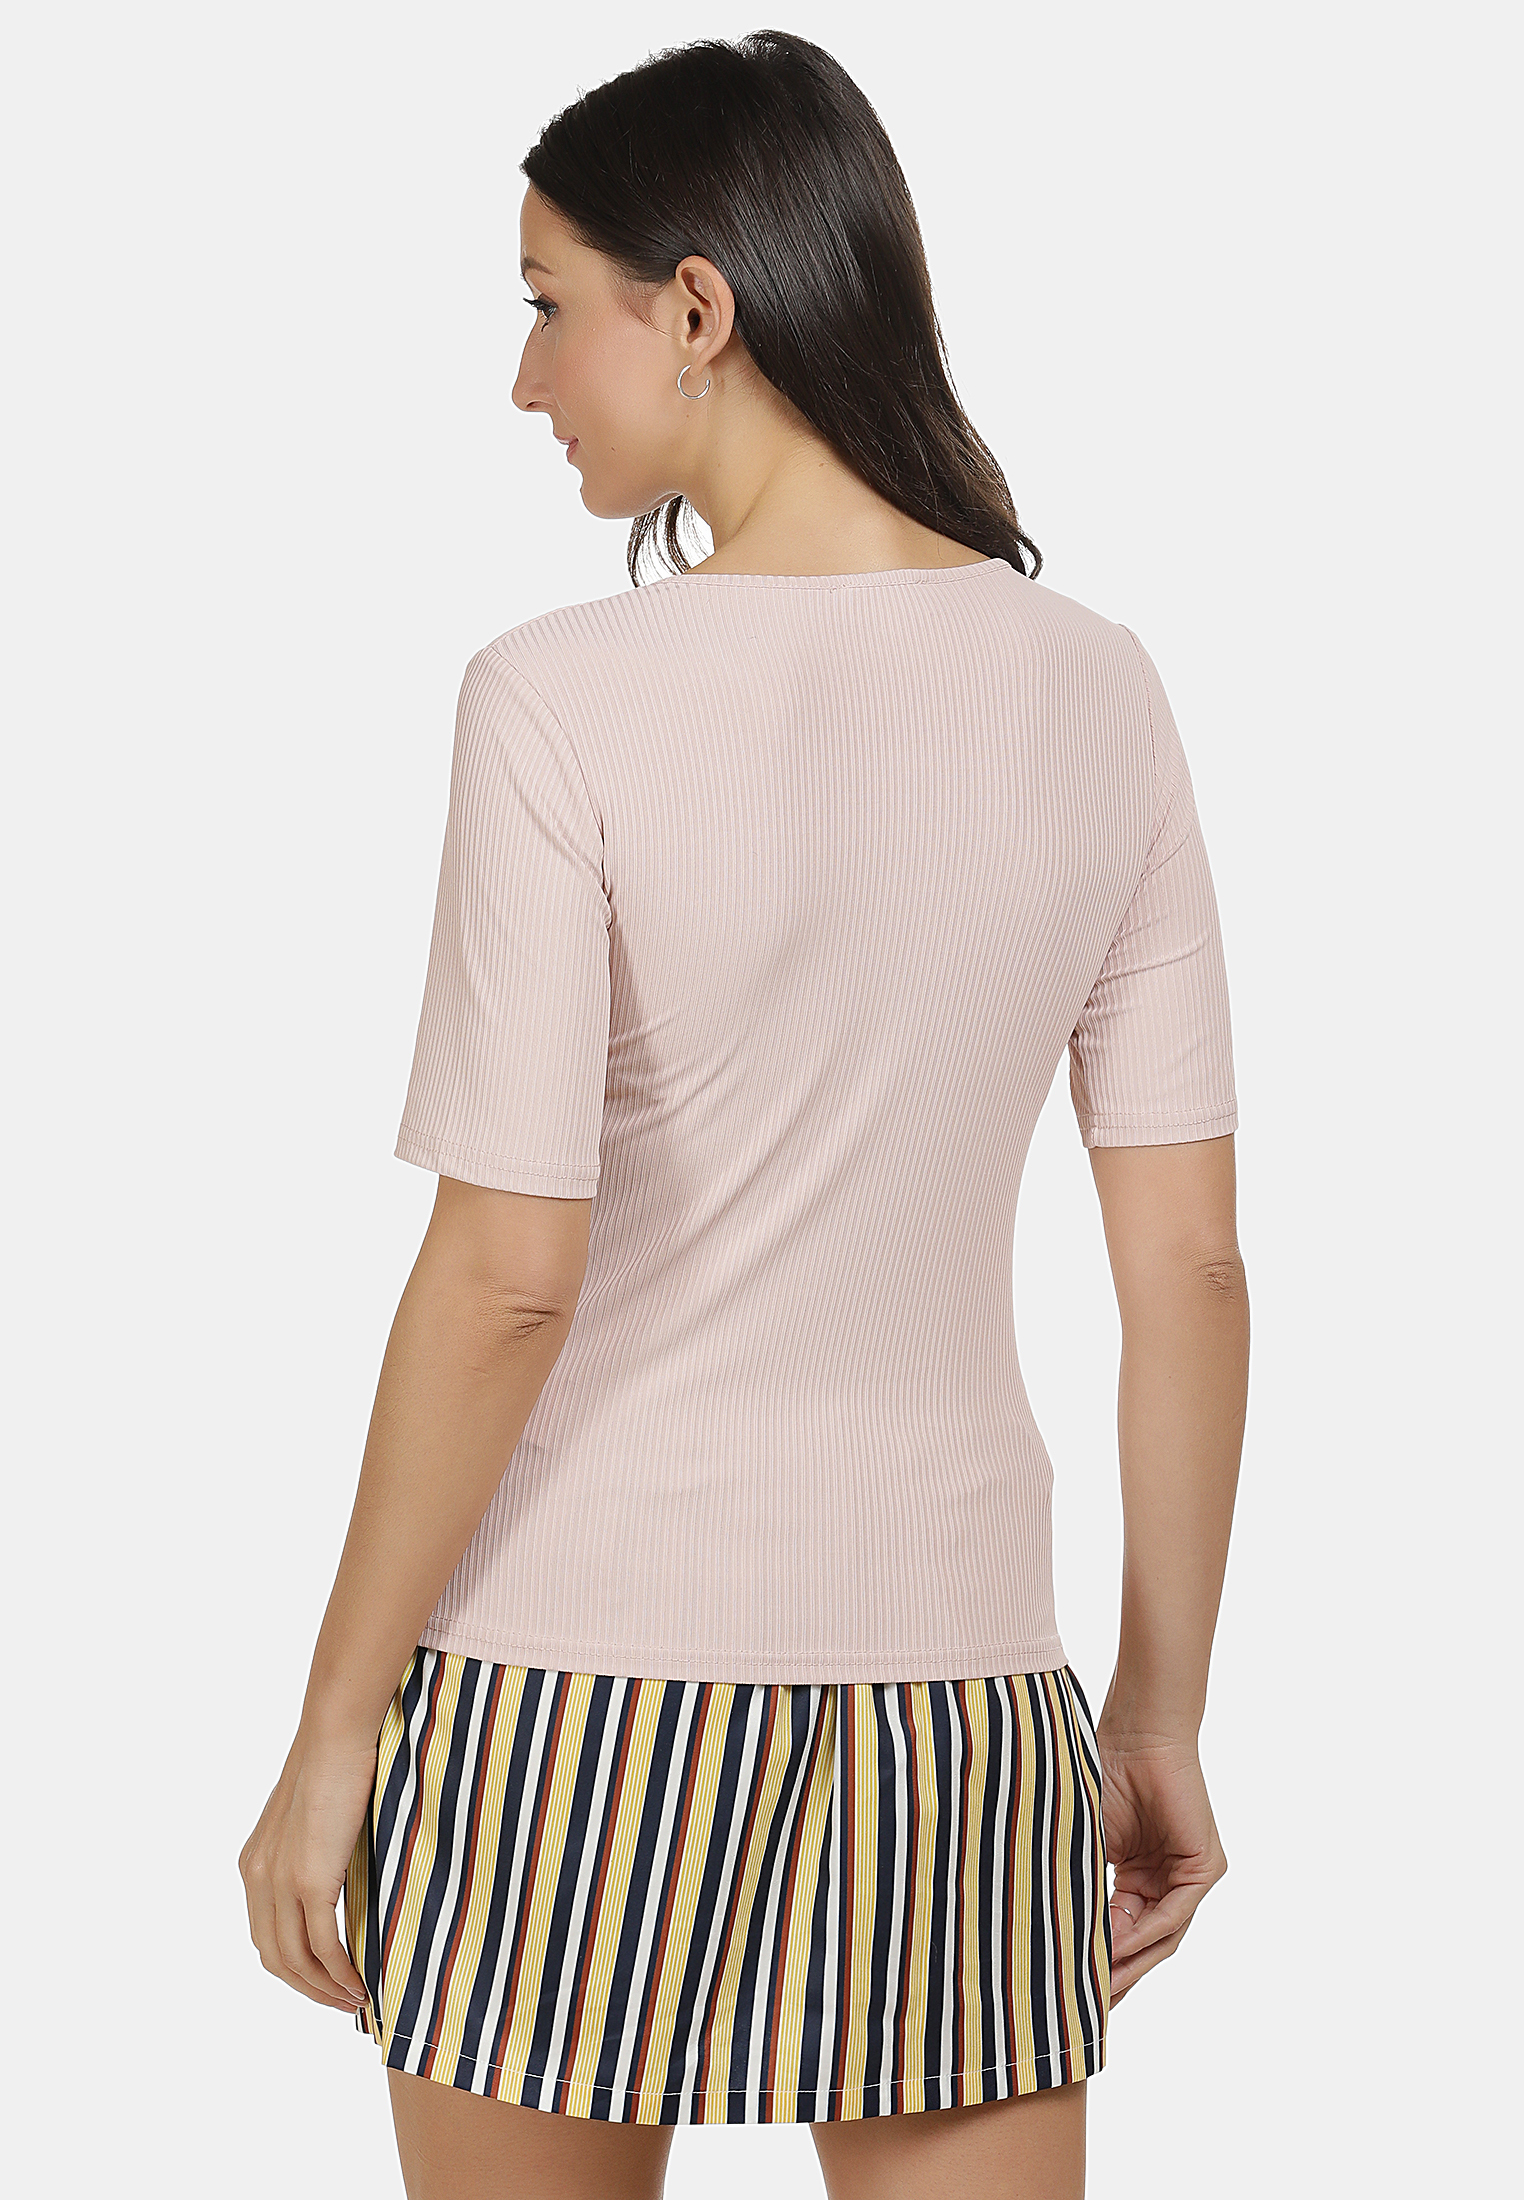 Usha BLUE LABEL Shirt in rosa günstig kaufen